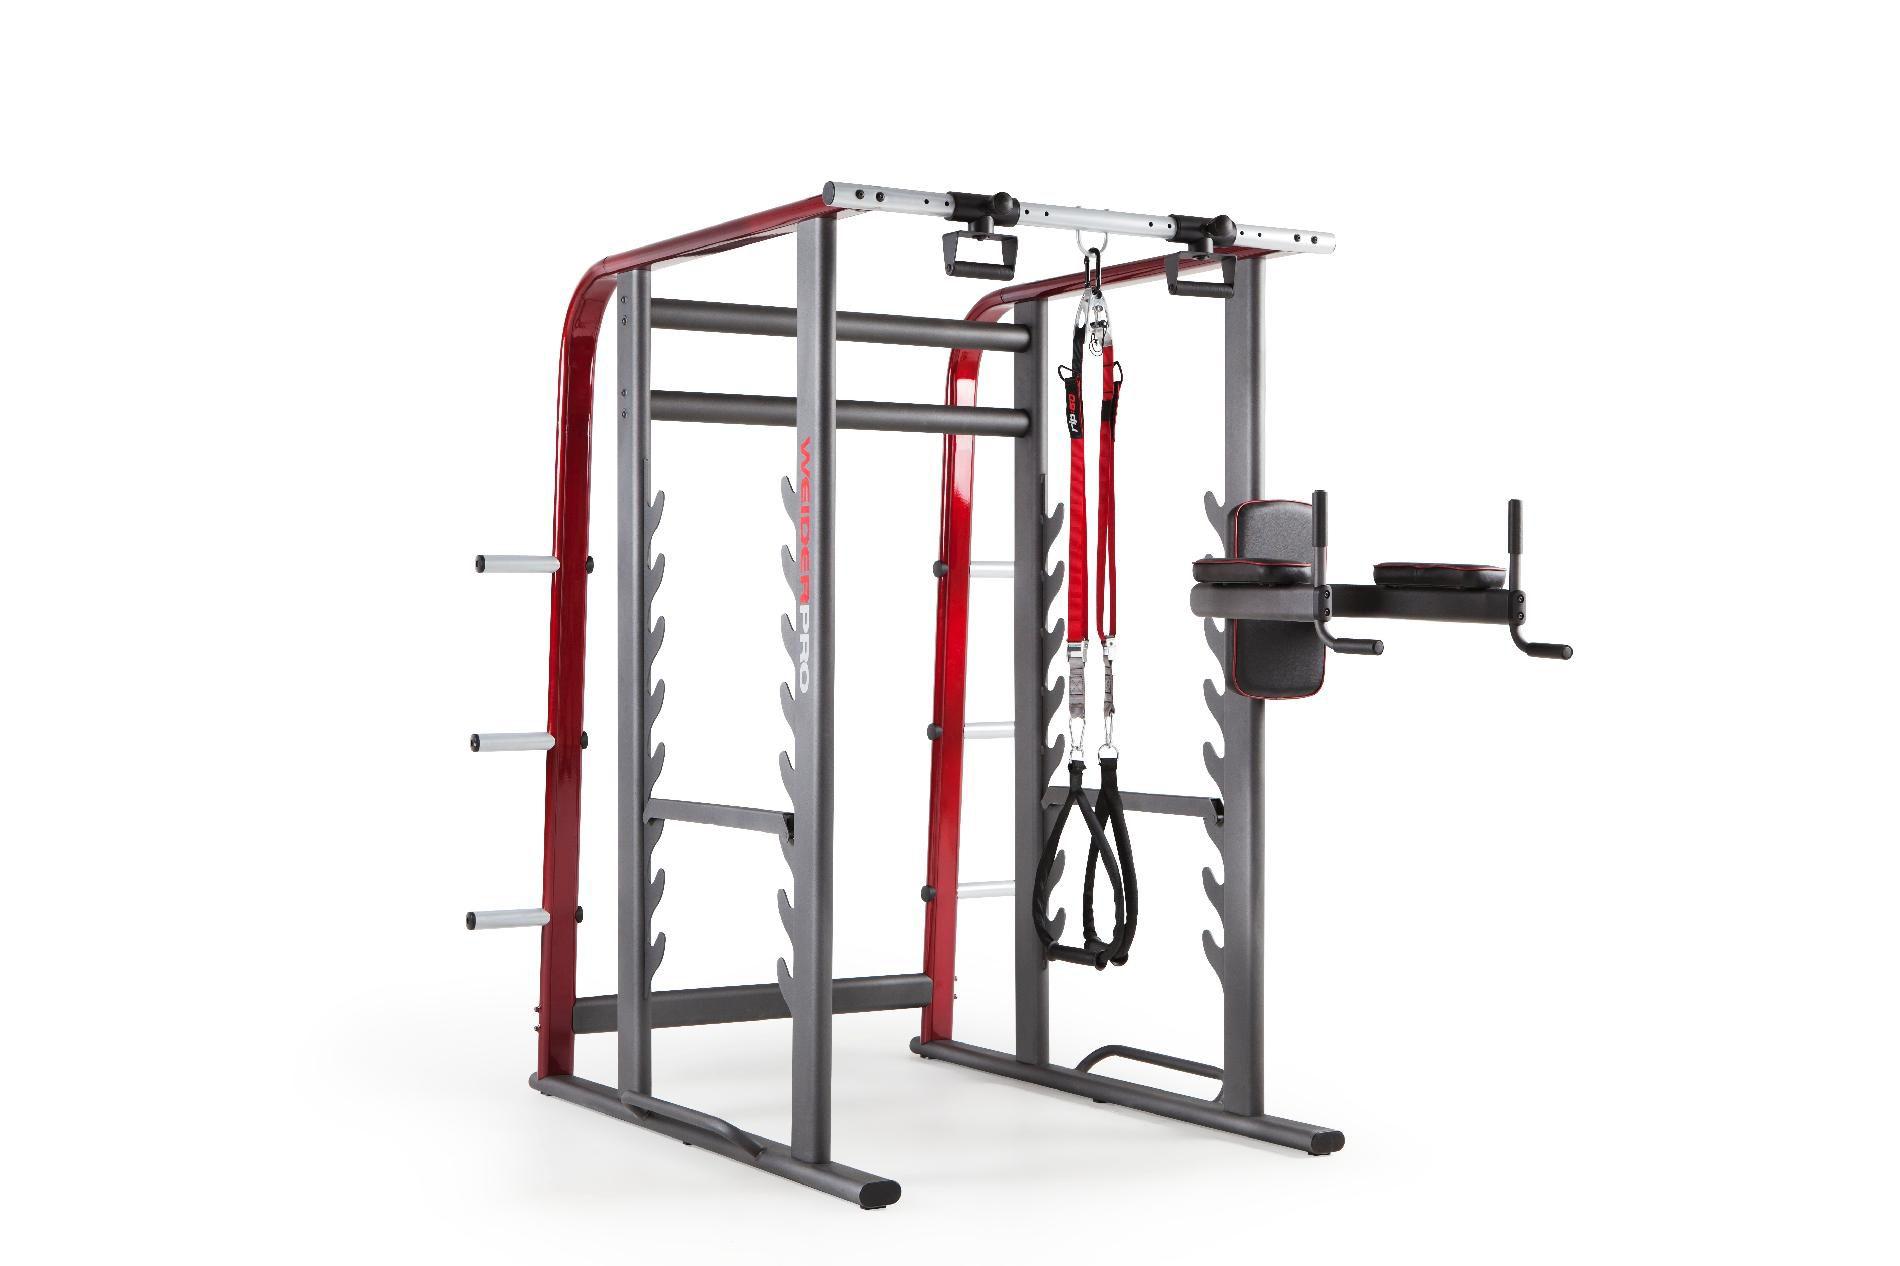 weider pro power cage 500 l 699 99